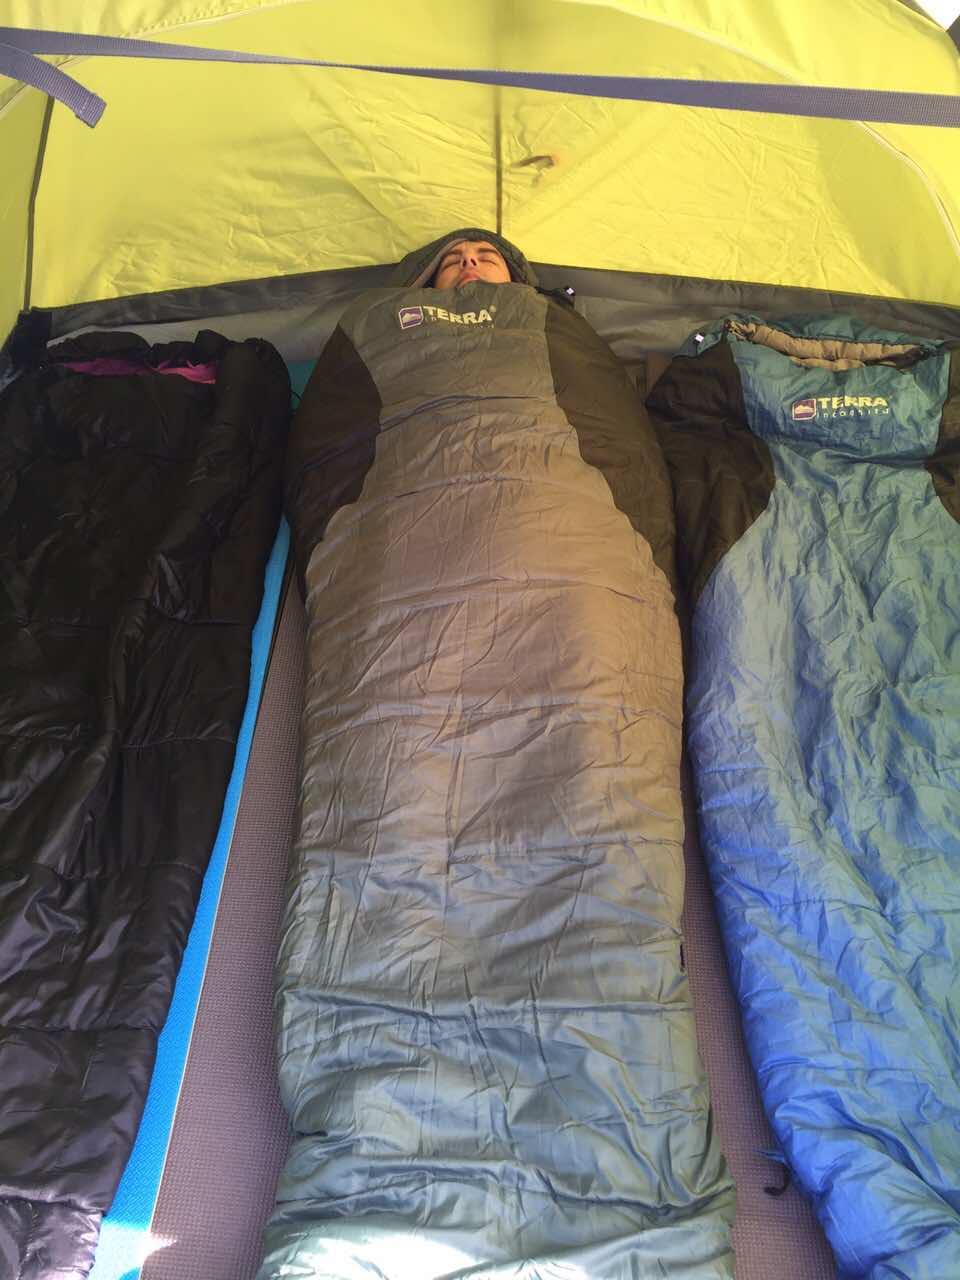 Спальник Terra Incognita PHARAON EVO 300 (-12 -5 +20°C) – комфорт сну в  будь-яких умовах 386c4faa3533c